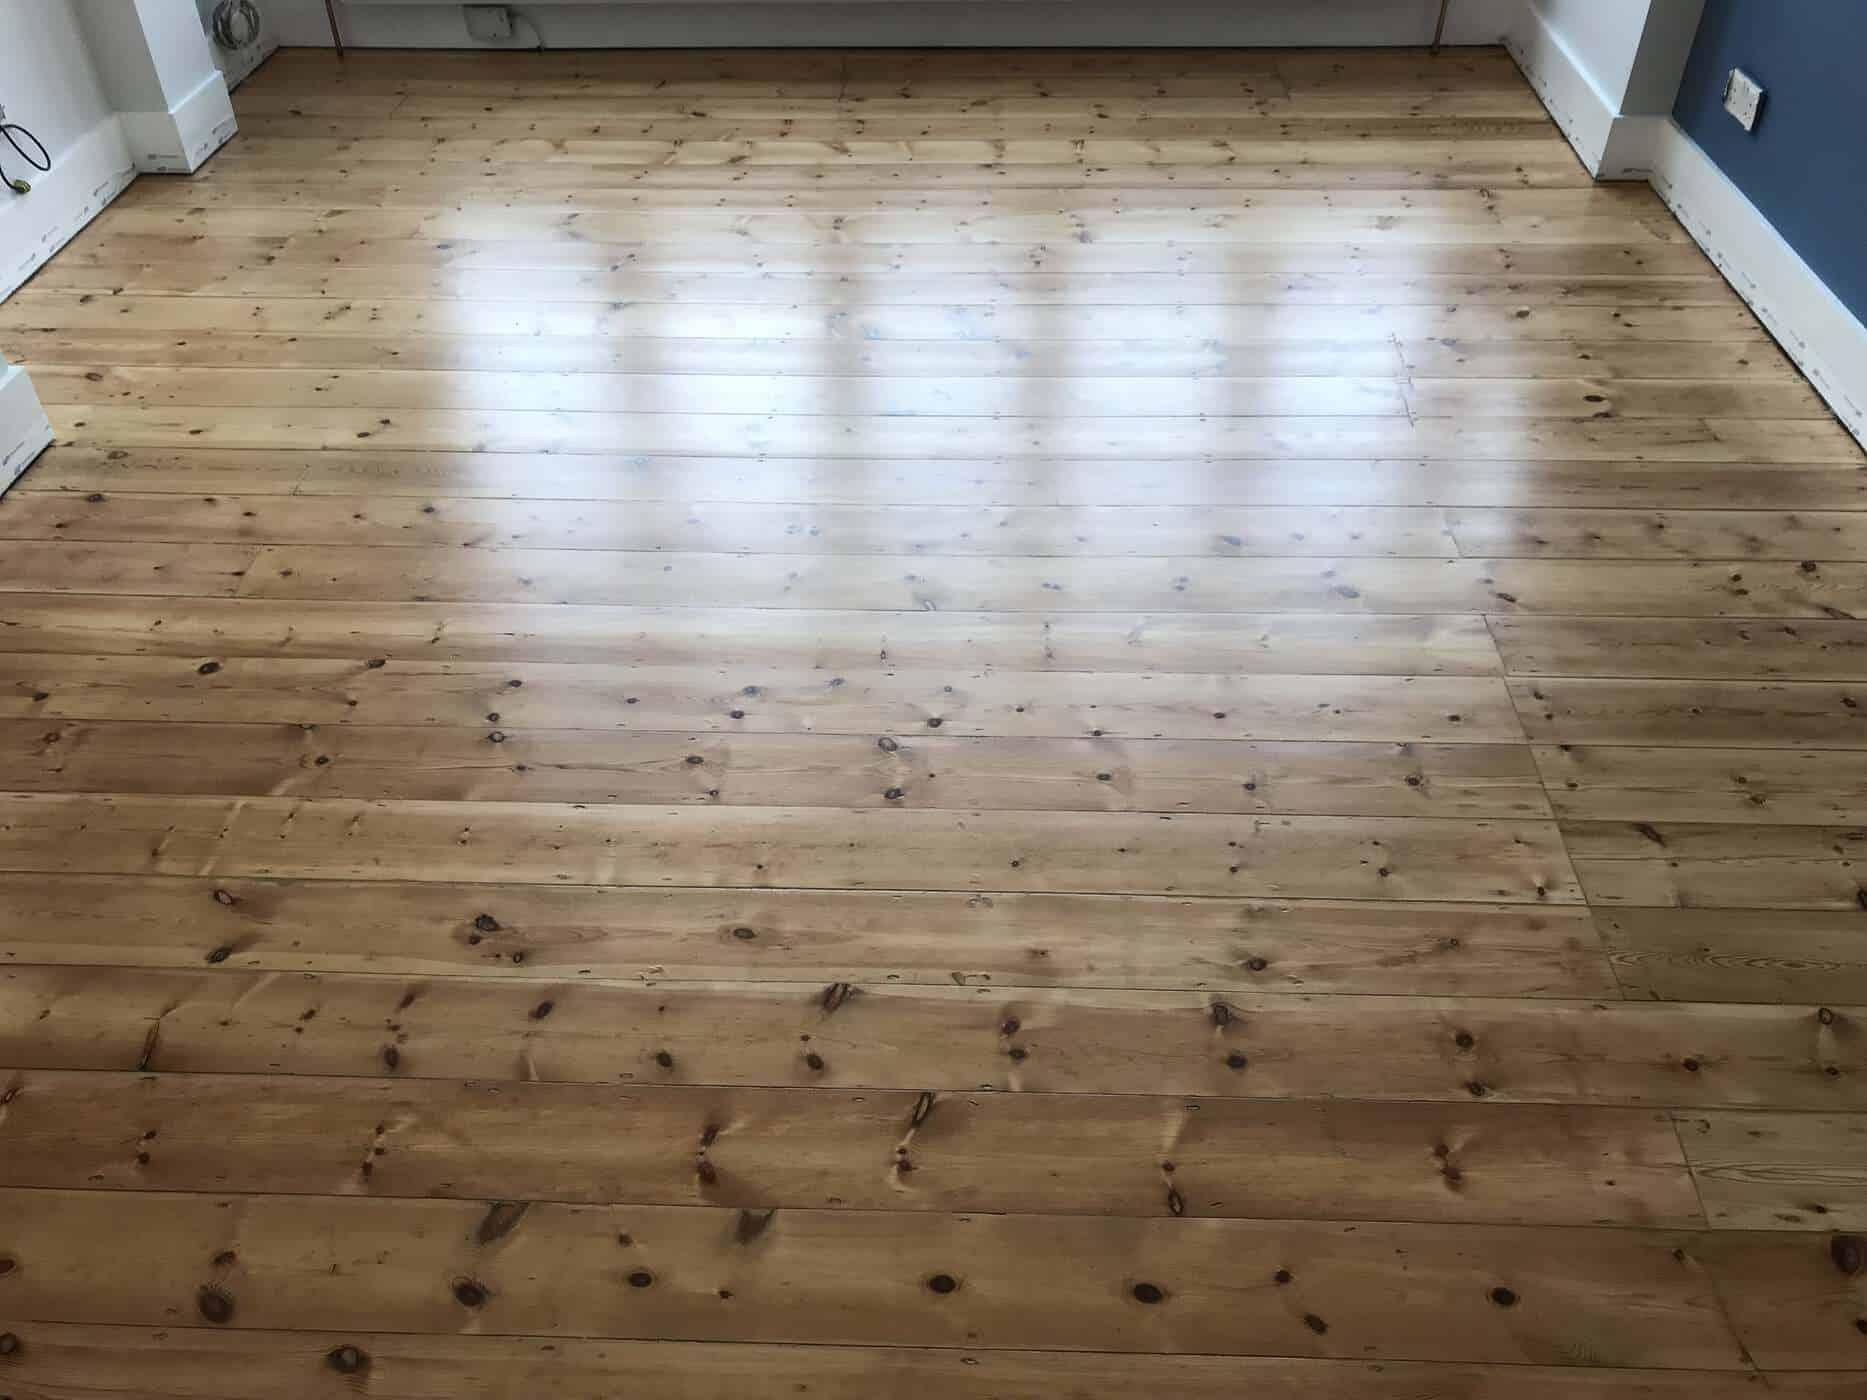 West-Norwood-Floor-Sanding-Services-After